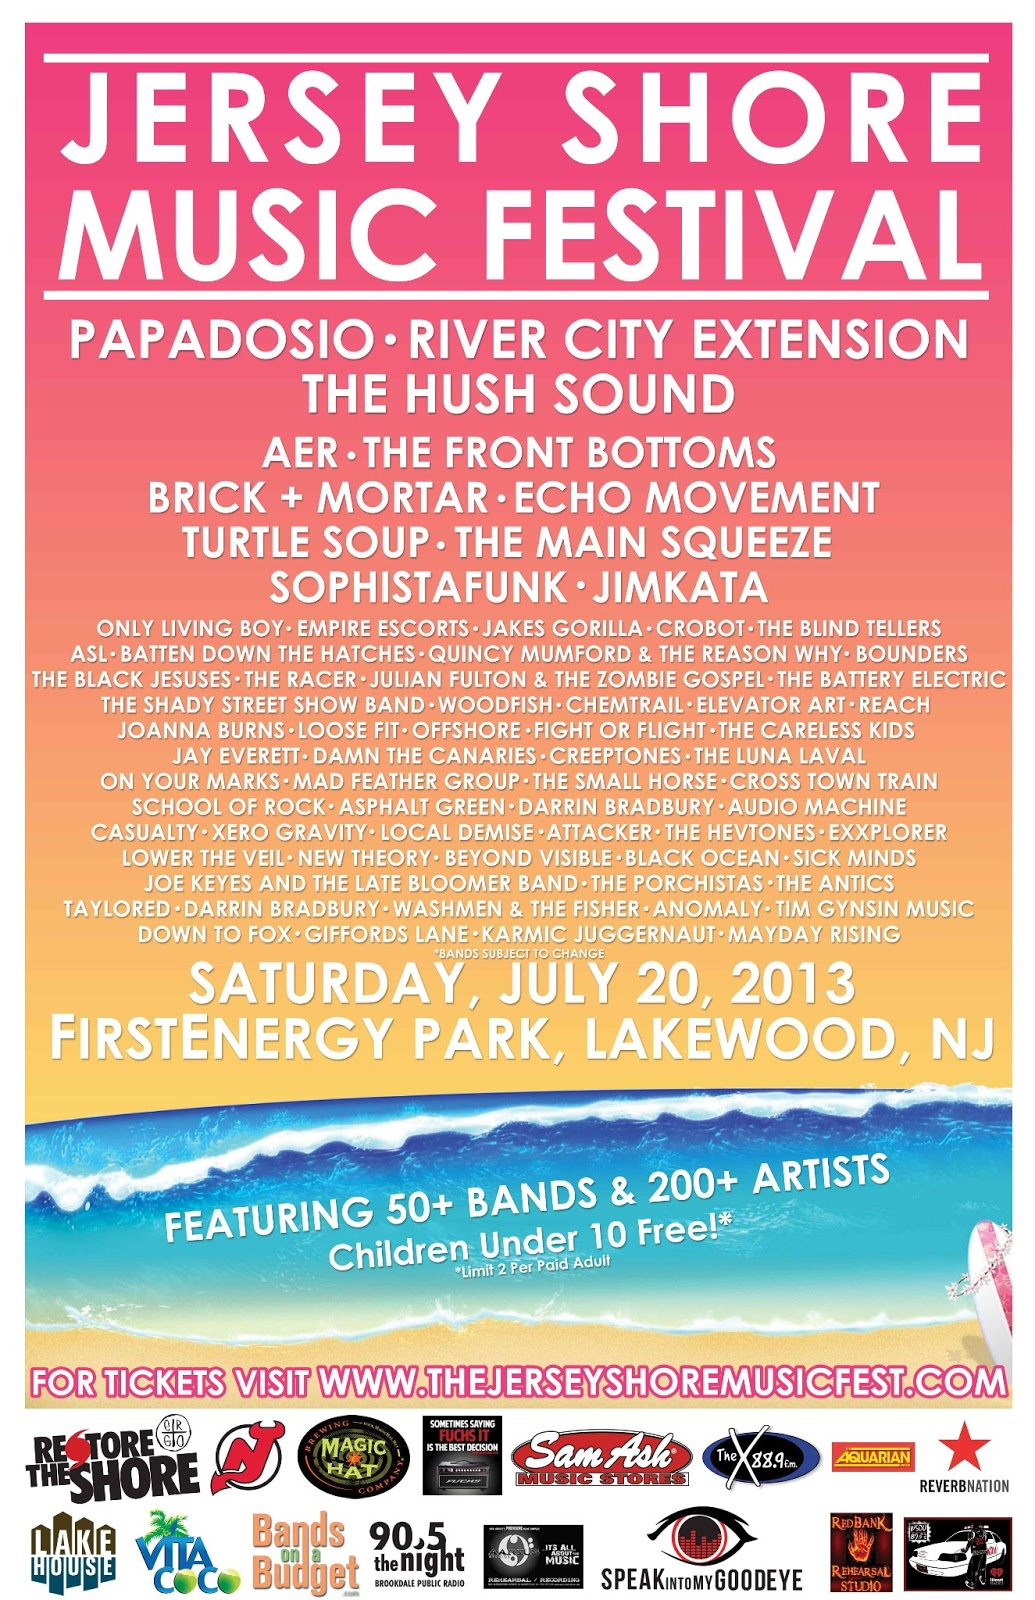 Jersey Shore Music Fest Edition | CoolDad Music